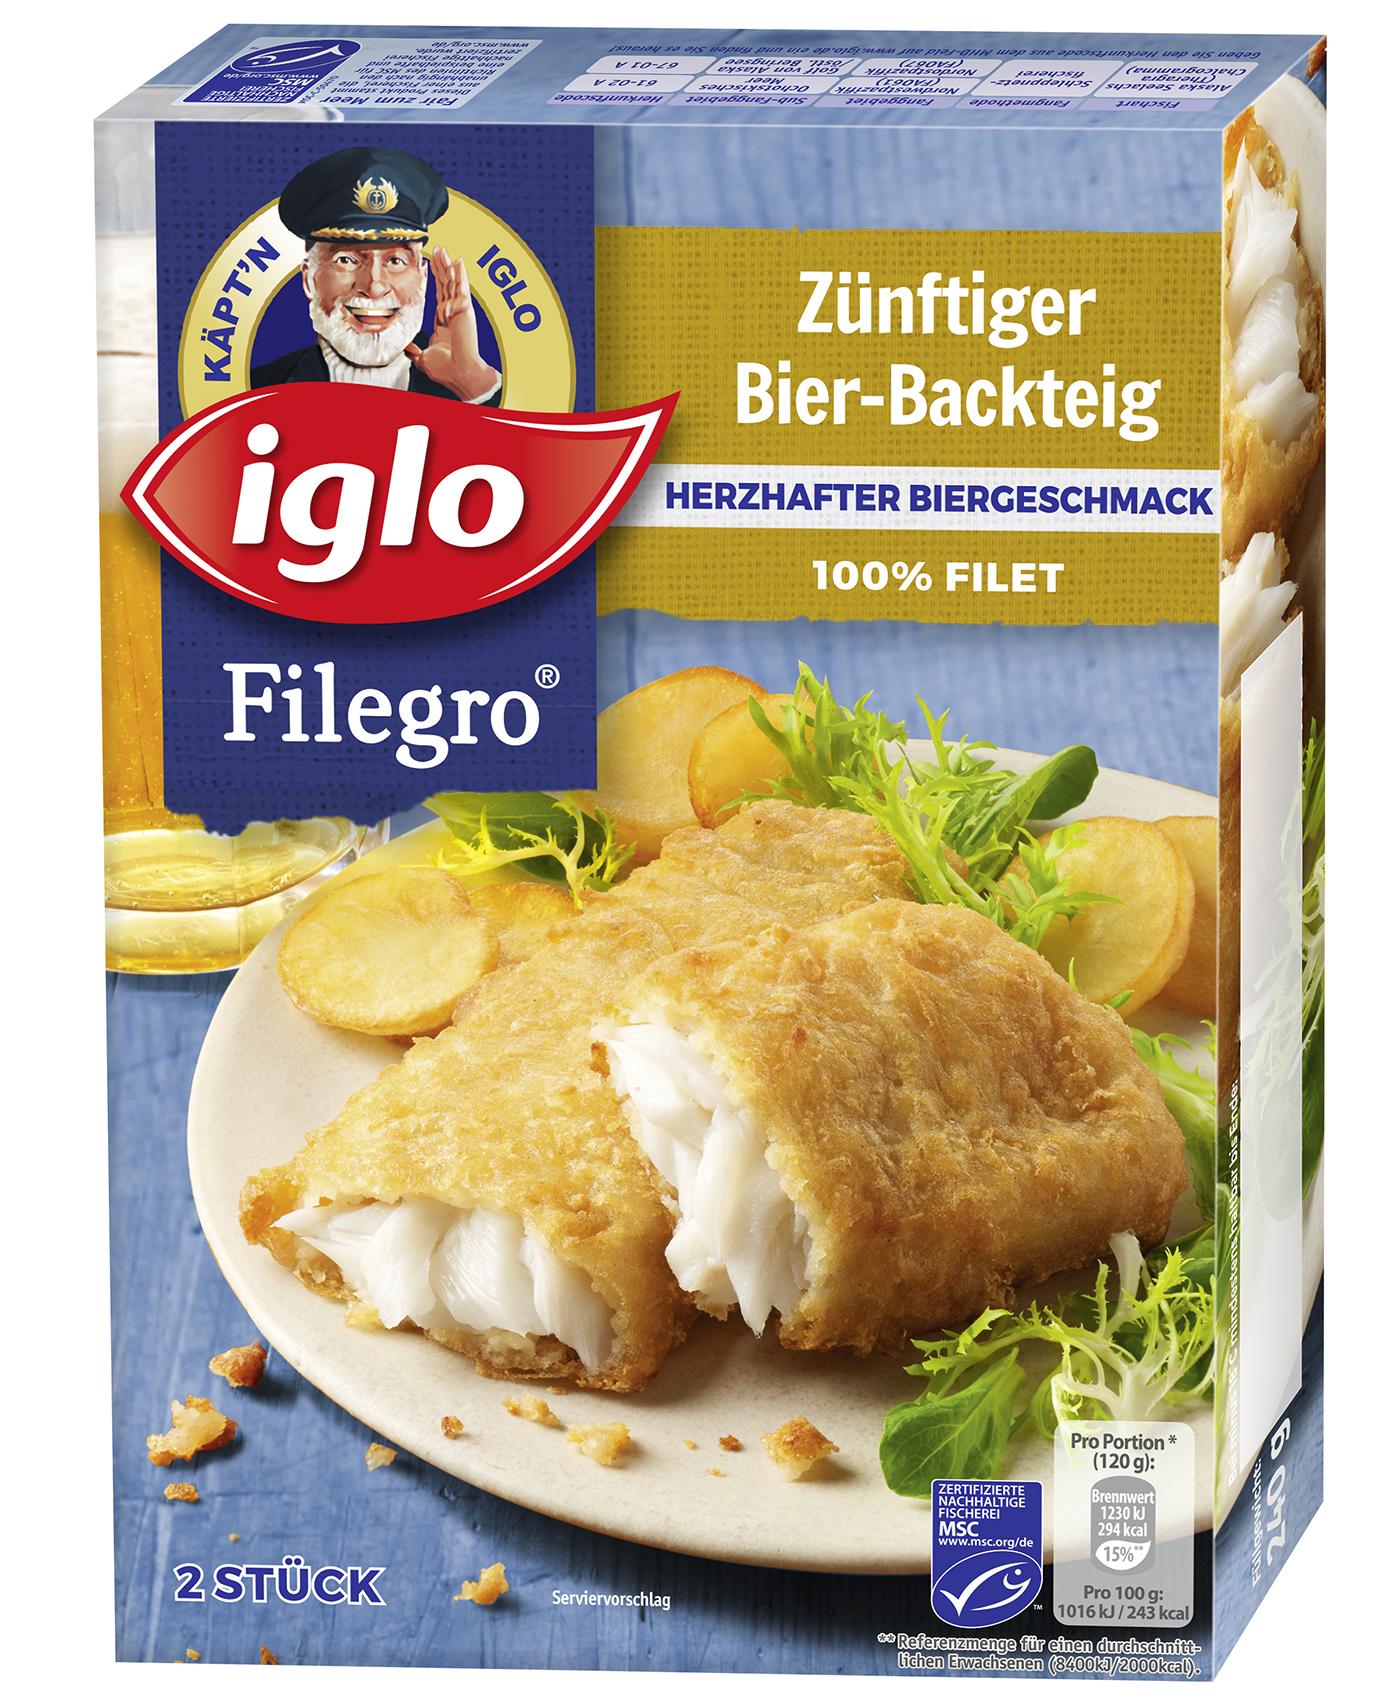 Filegro_Bierback_20170111